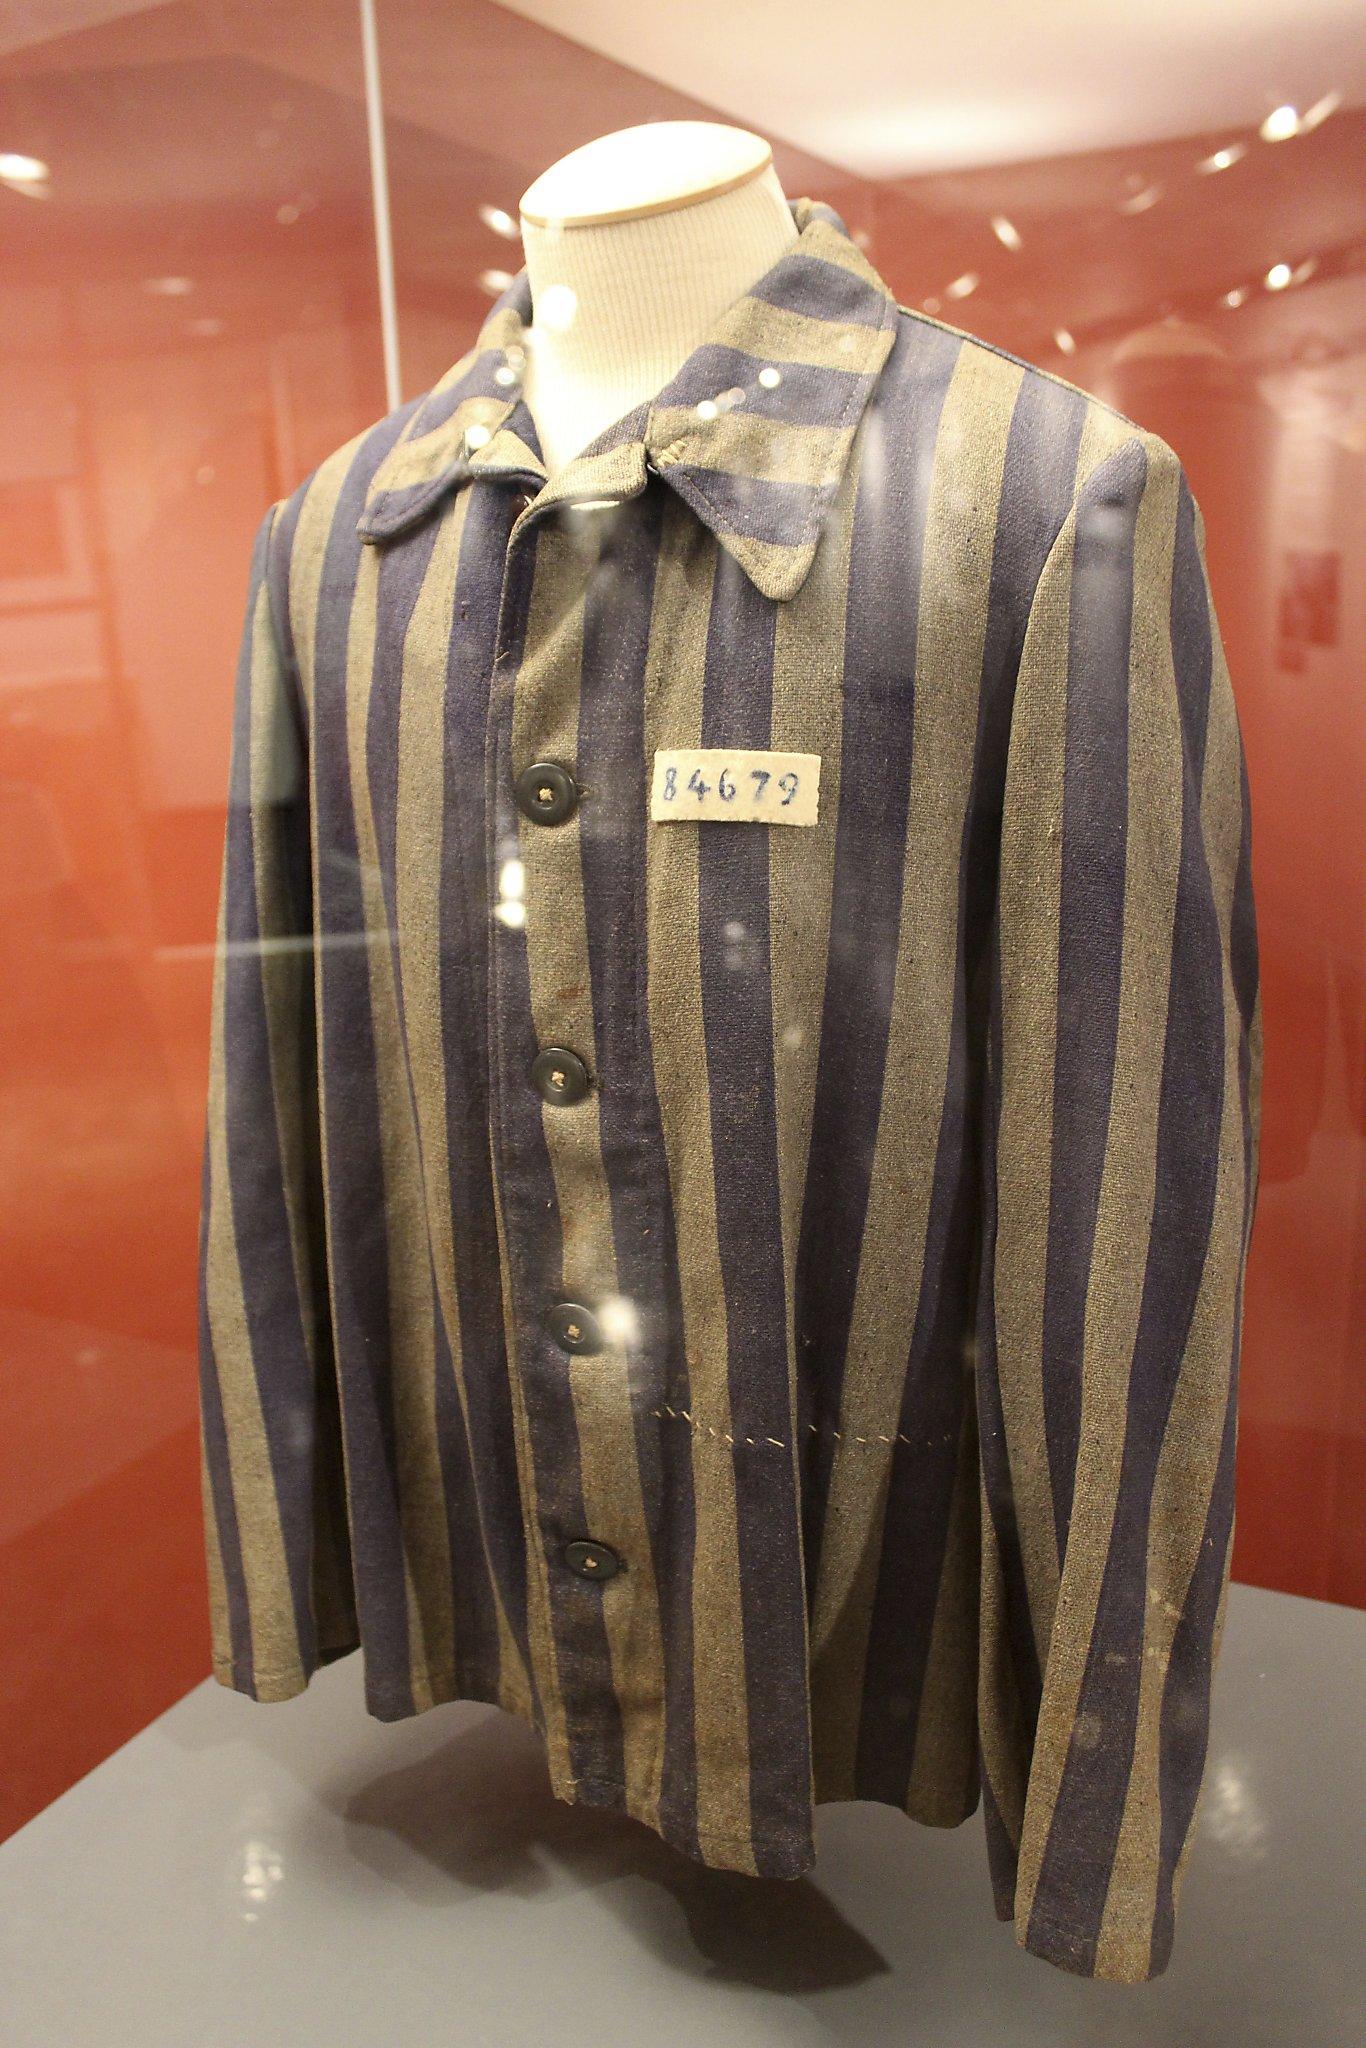 Holocaust Jacket, Prisoneru0027s Story, Found At New York Tag Sale   SFGate